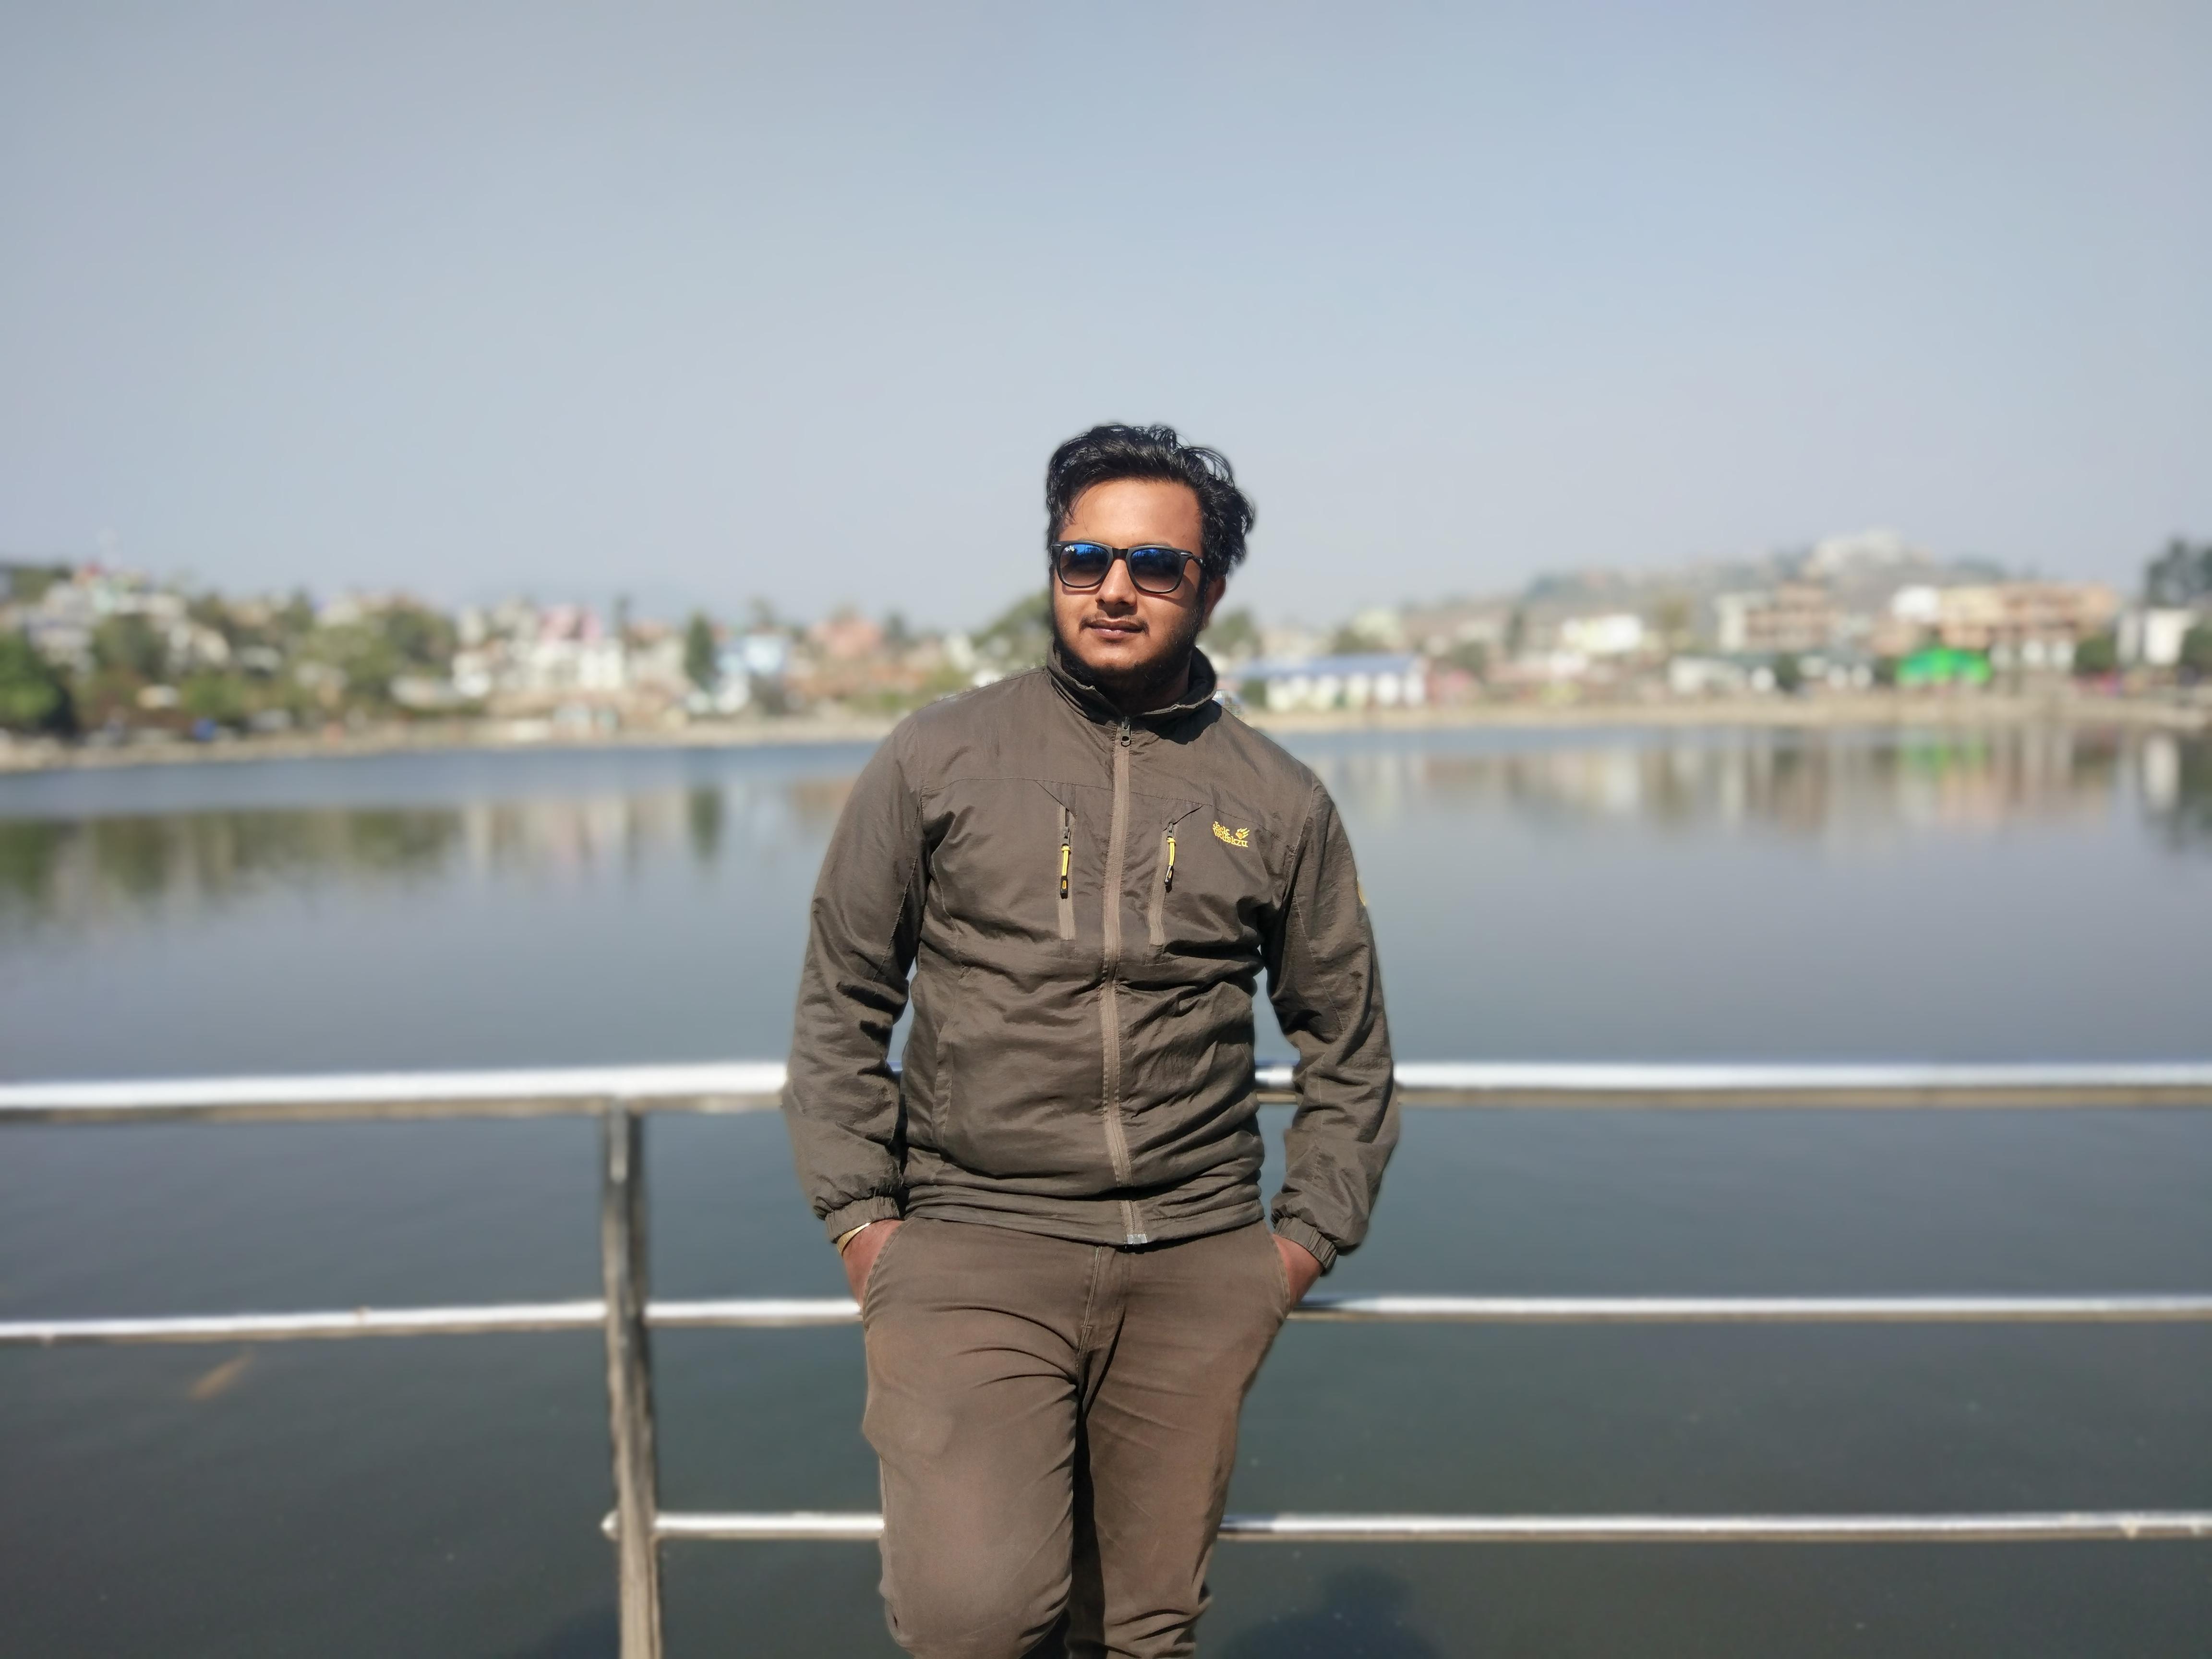 Shivam Paudel